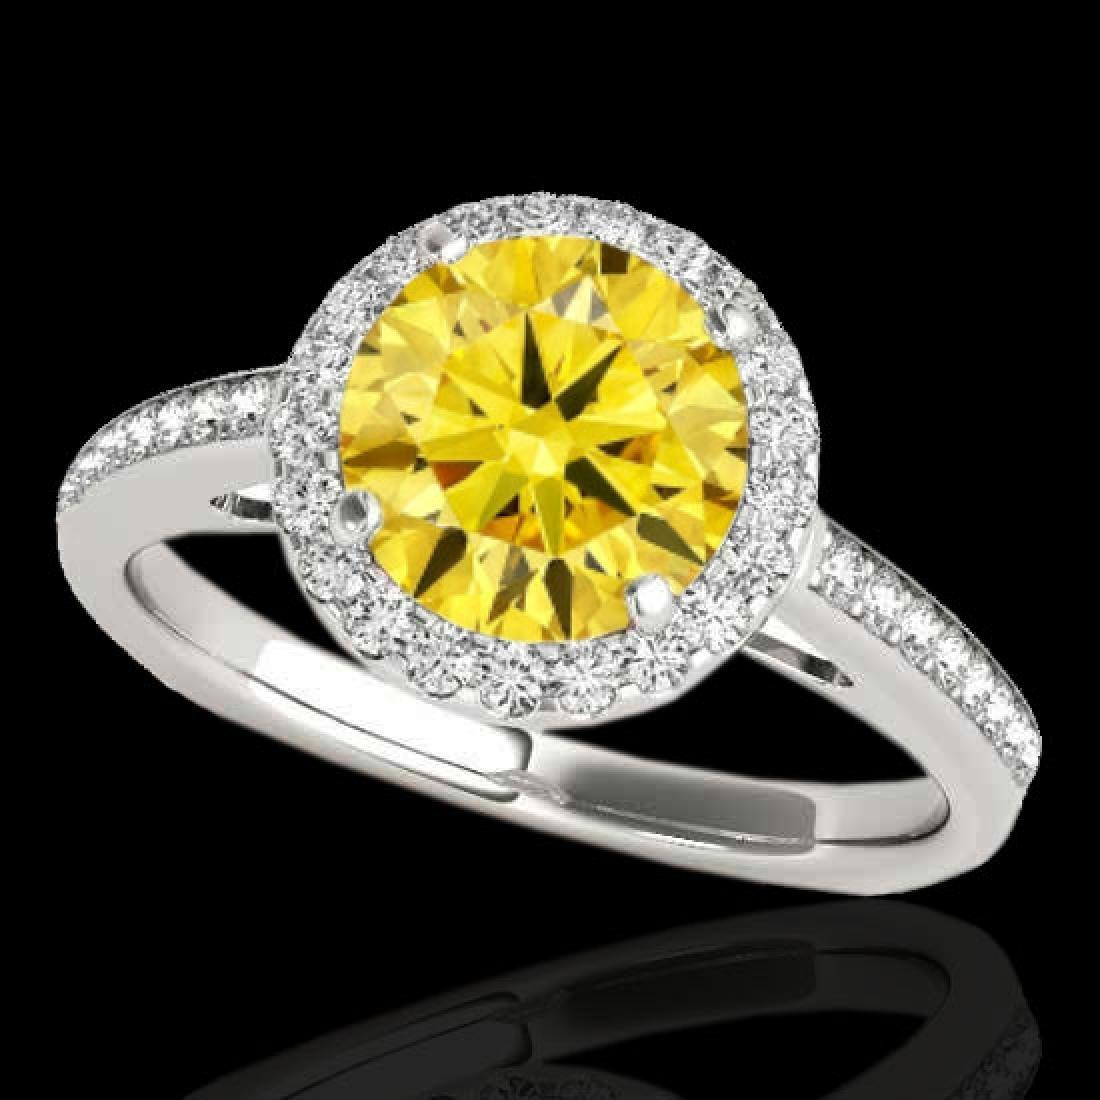 1.3 CTW Certified Si Fancy Intense Diamond Solitaire